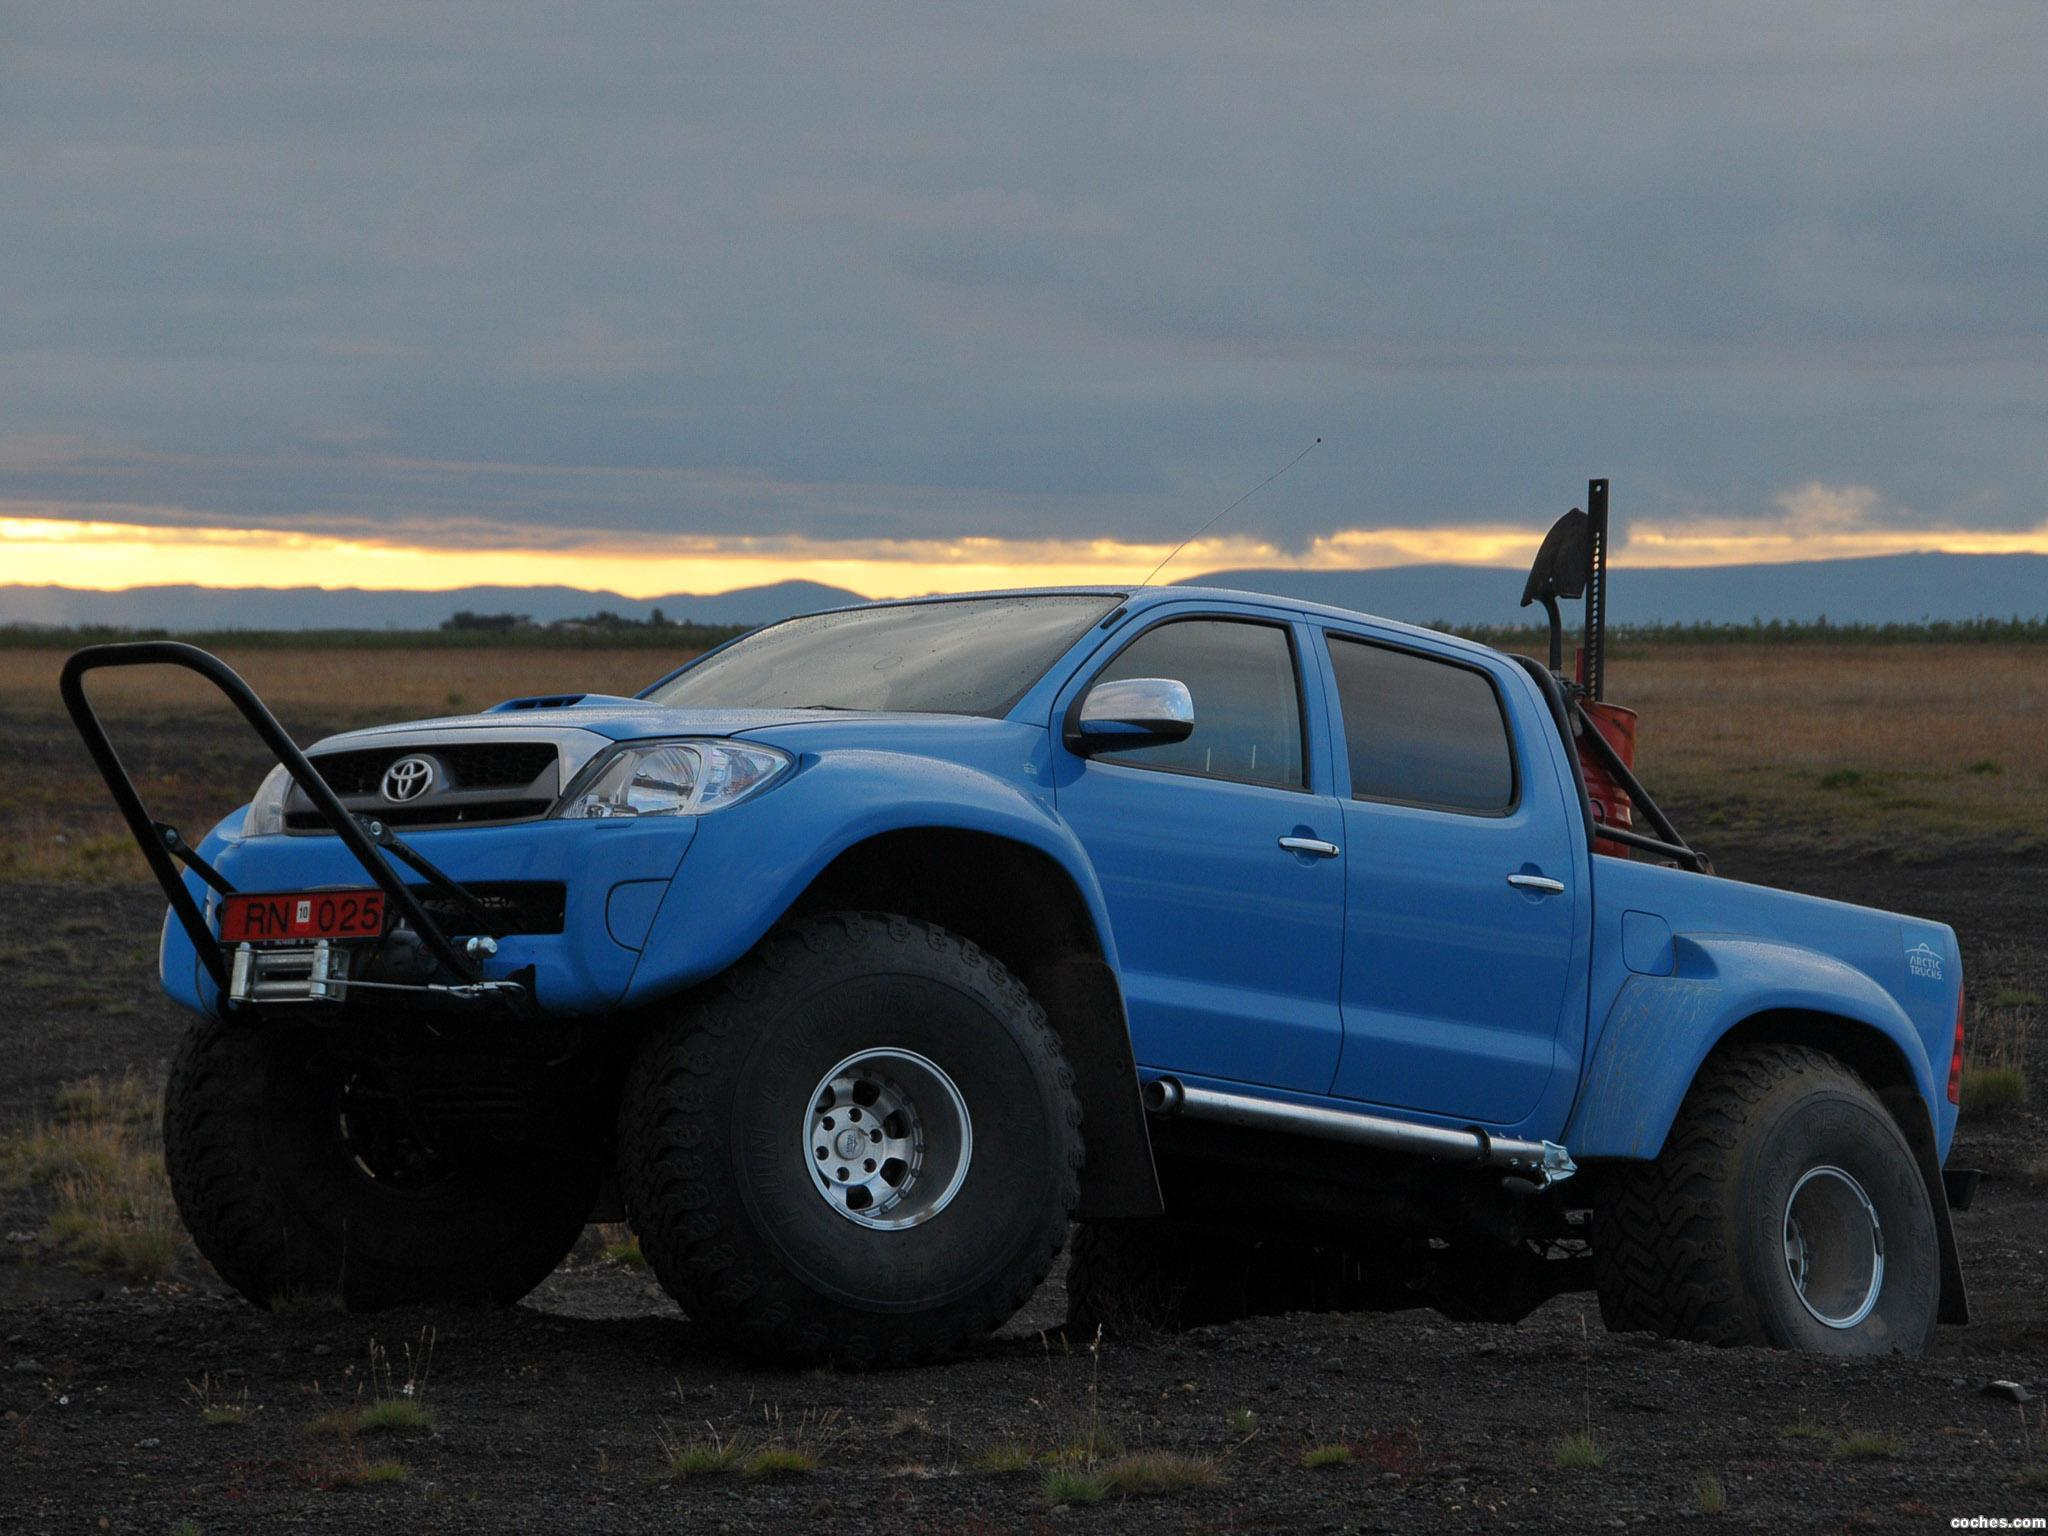 Foto 17 de Arctic Trucks Toyota Hilux AT44 South Pole Expedition 2010